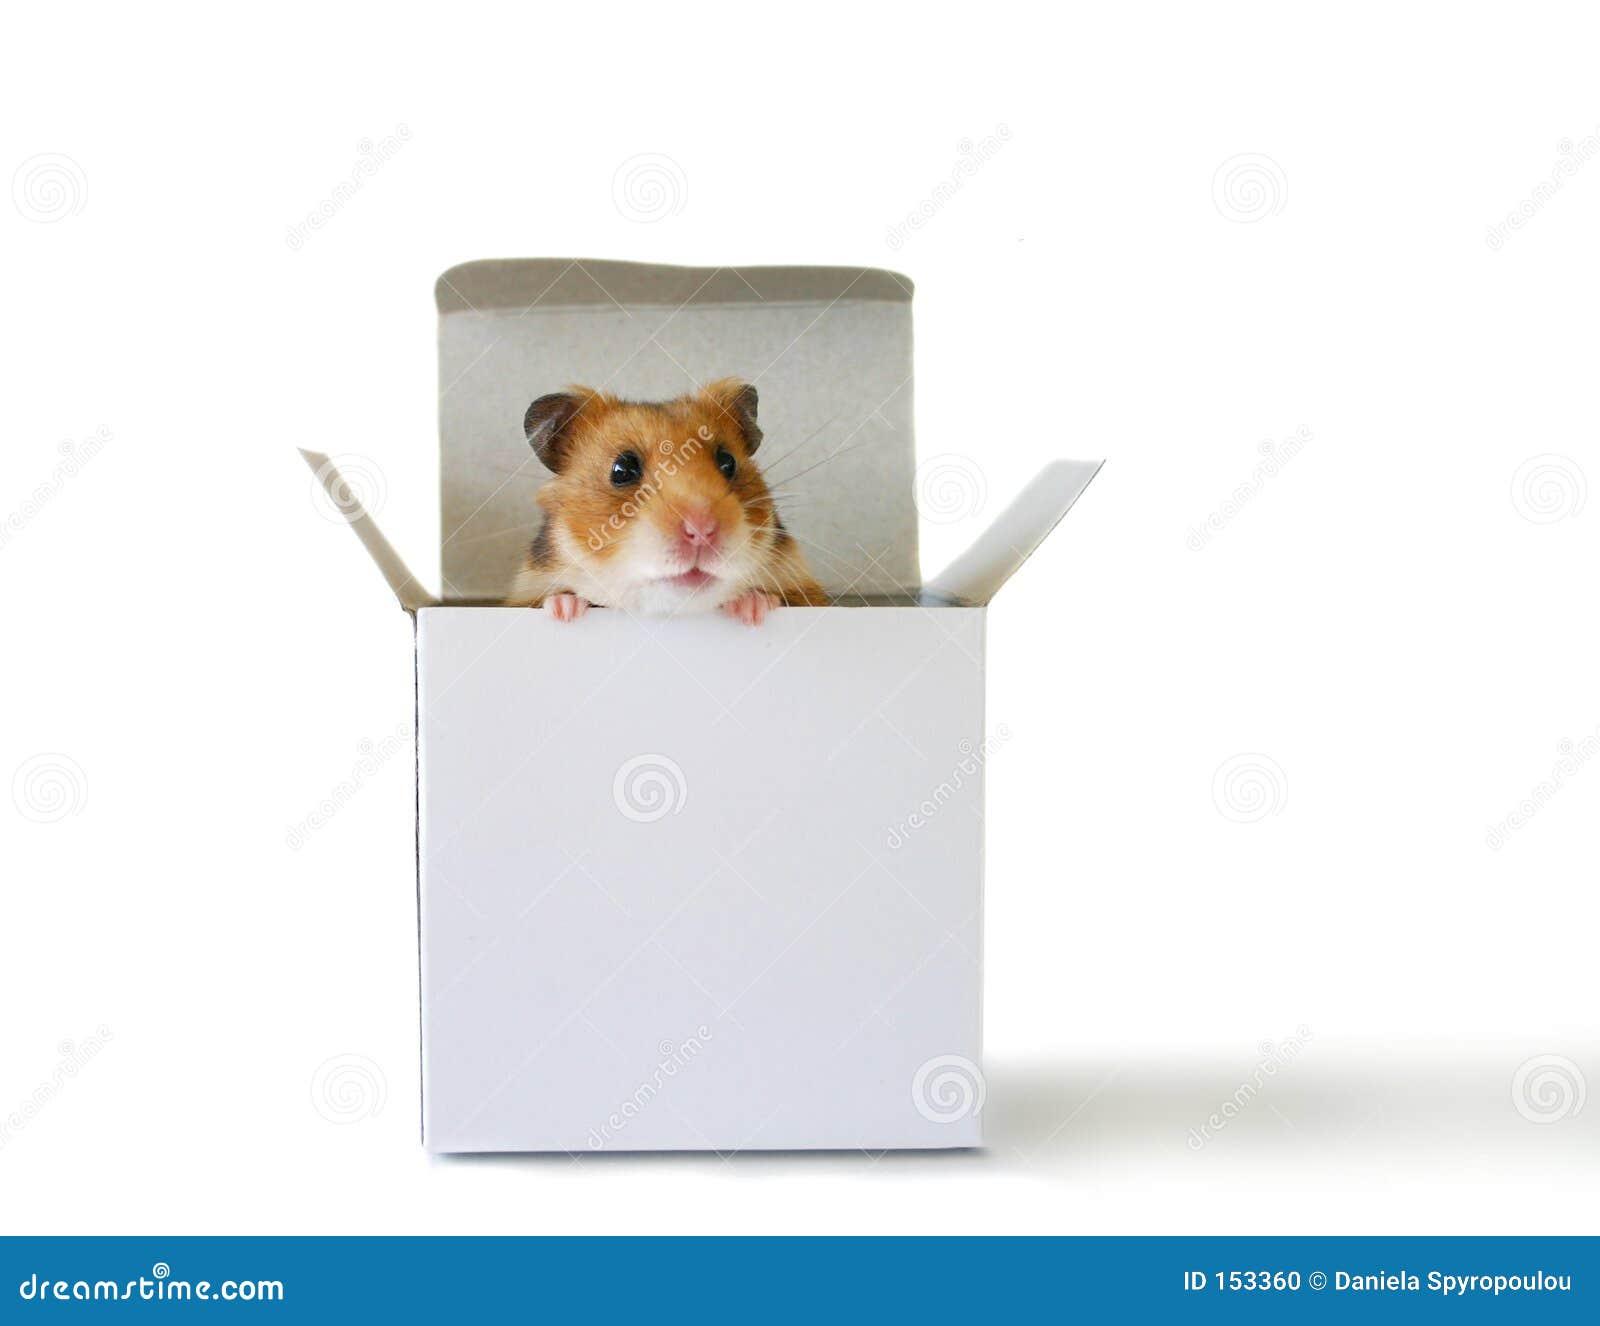 Inside the box (3)